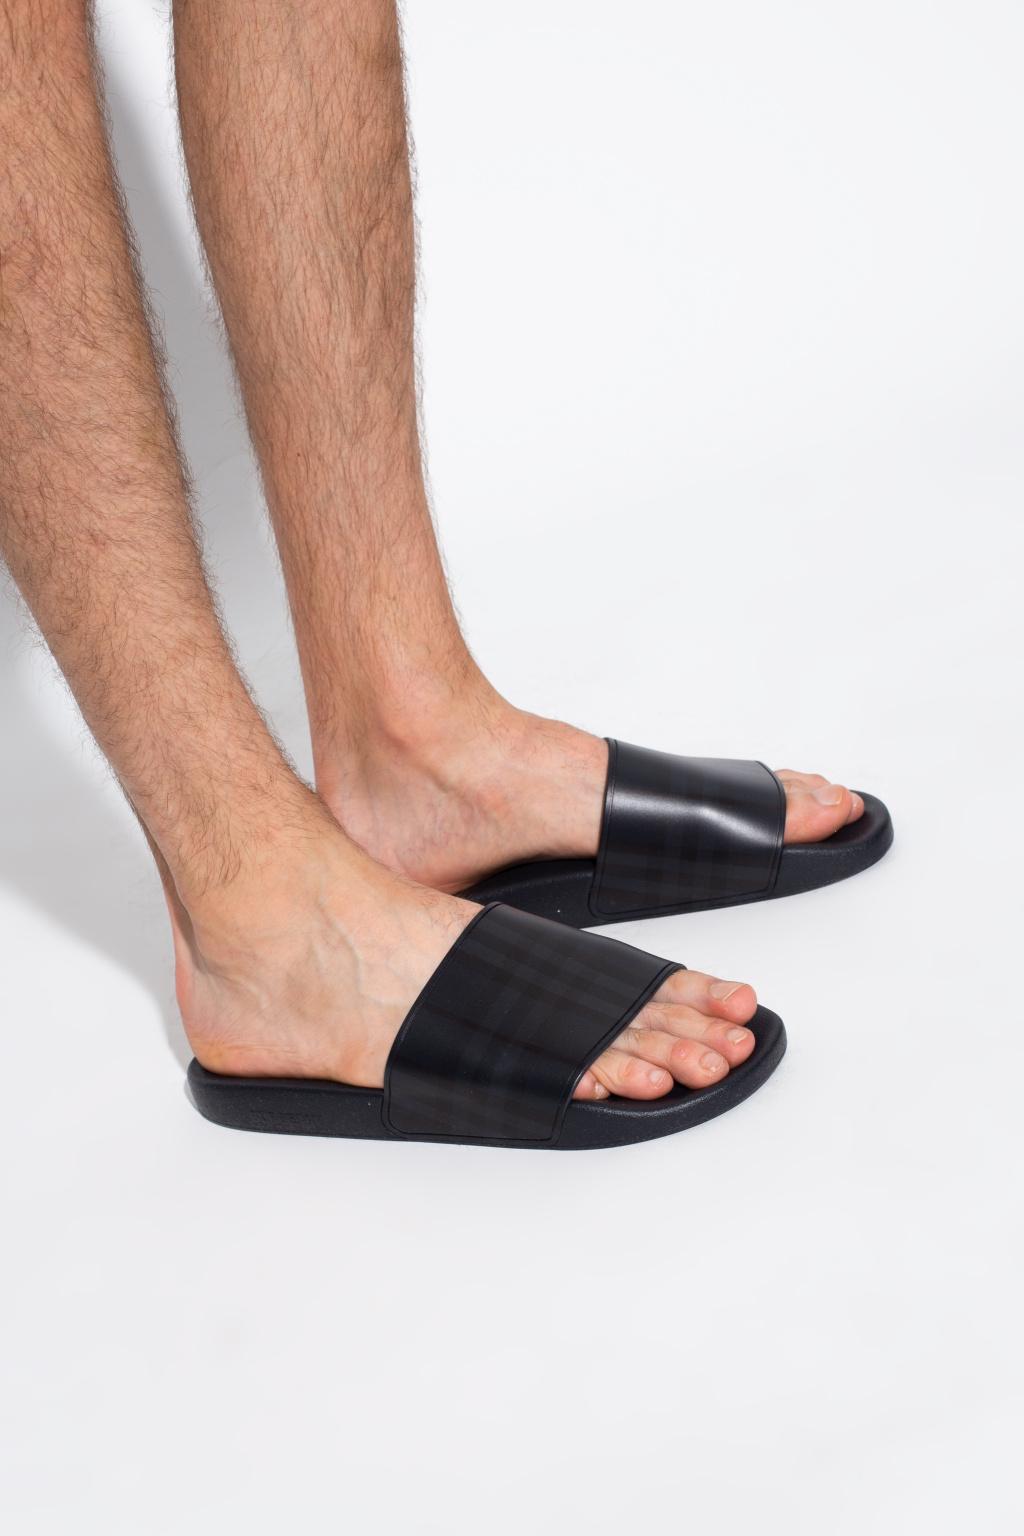 Burberry Rubber slides